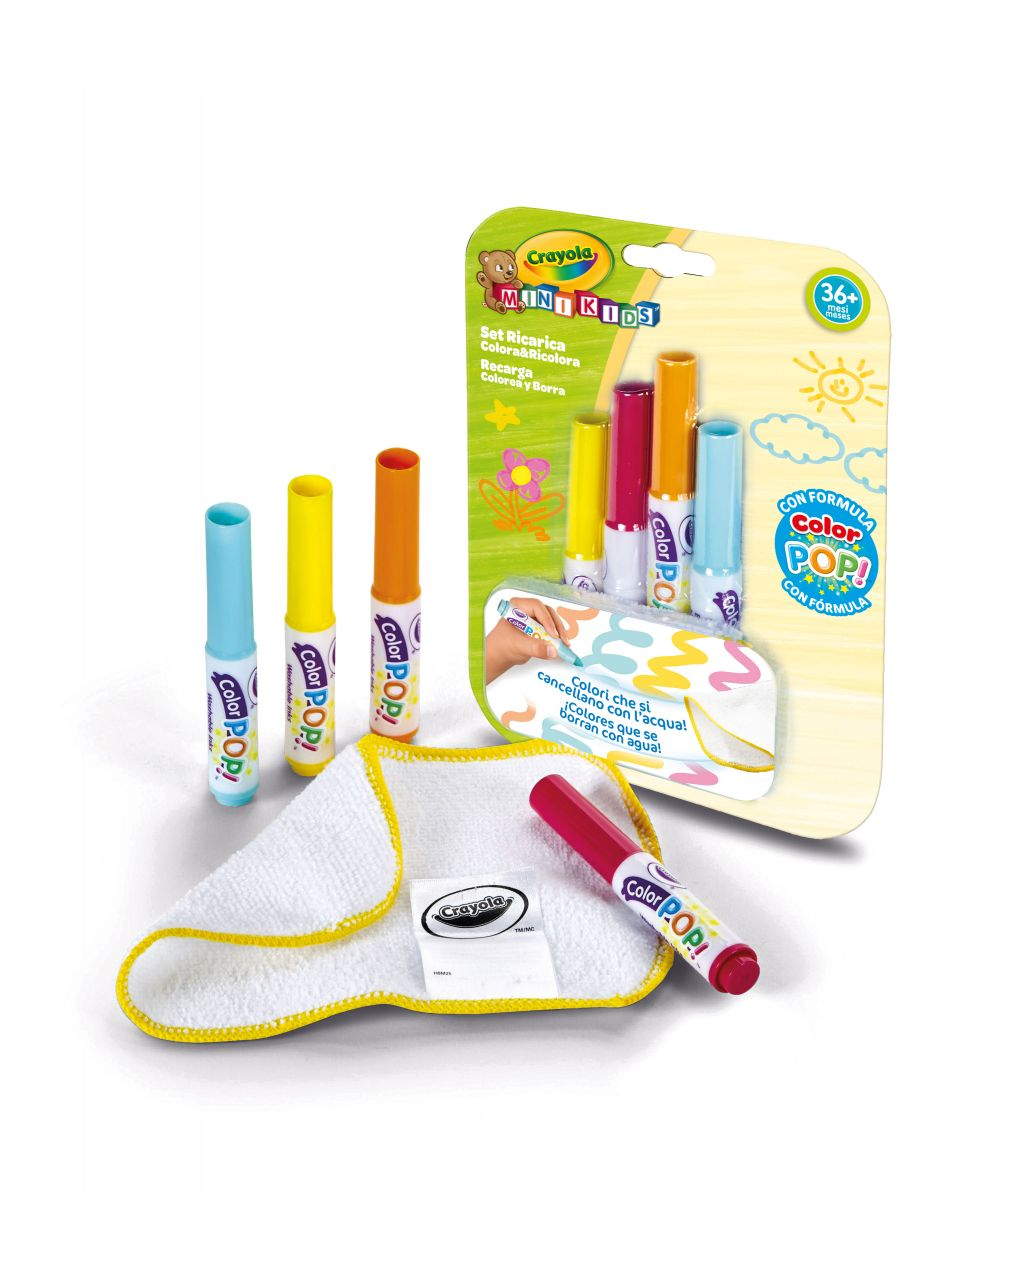 Crayola - ricarica tappetone colora & ricolora mini kids - Crayola